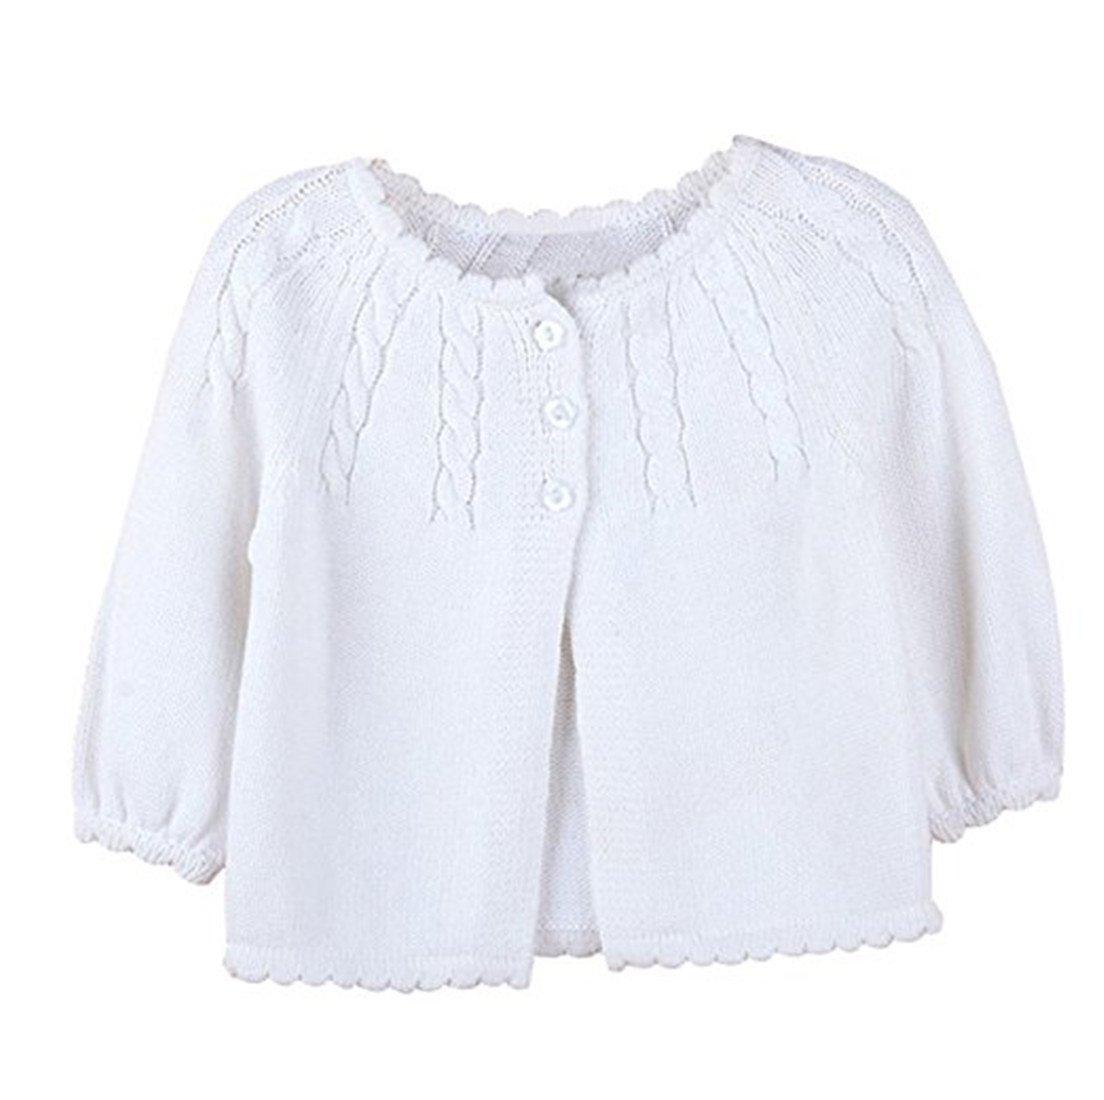 Toddler Kid Little Infant Girls Twist Ruffle Fine Knit Button-Down Cardigan Sweater Rca31